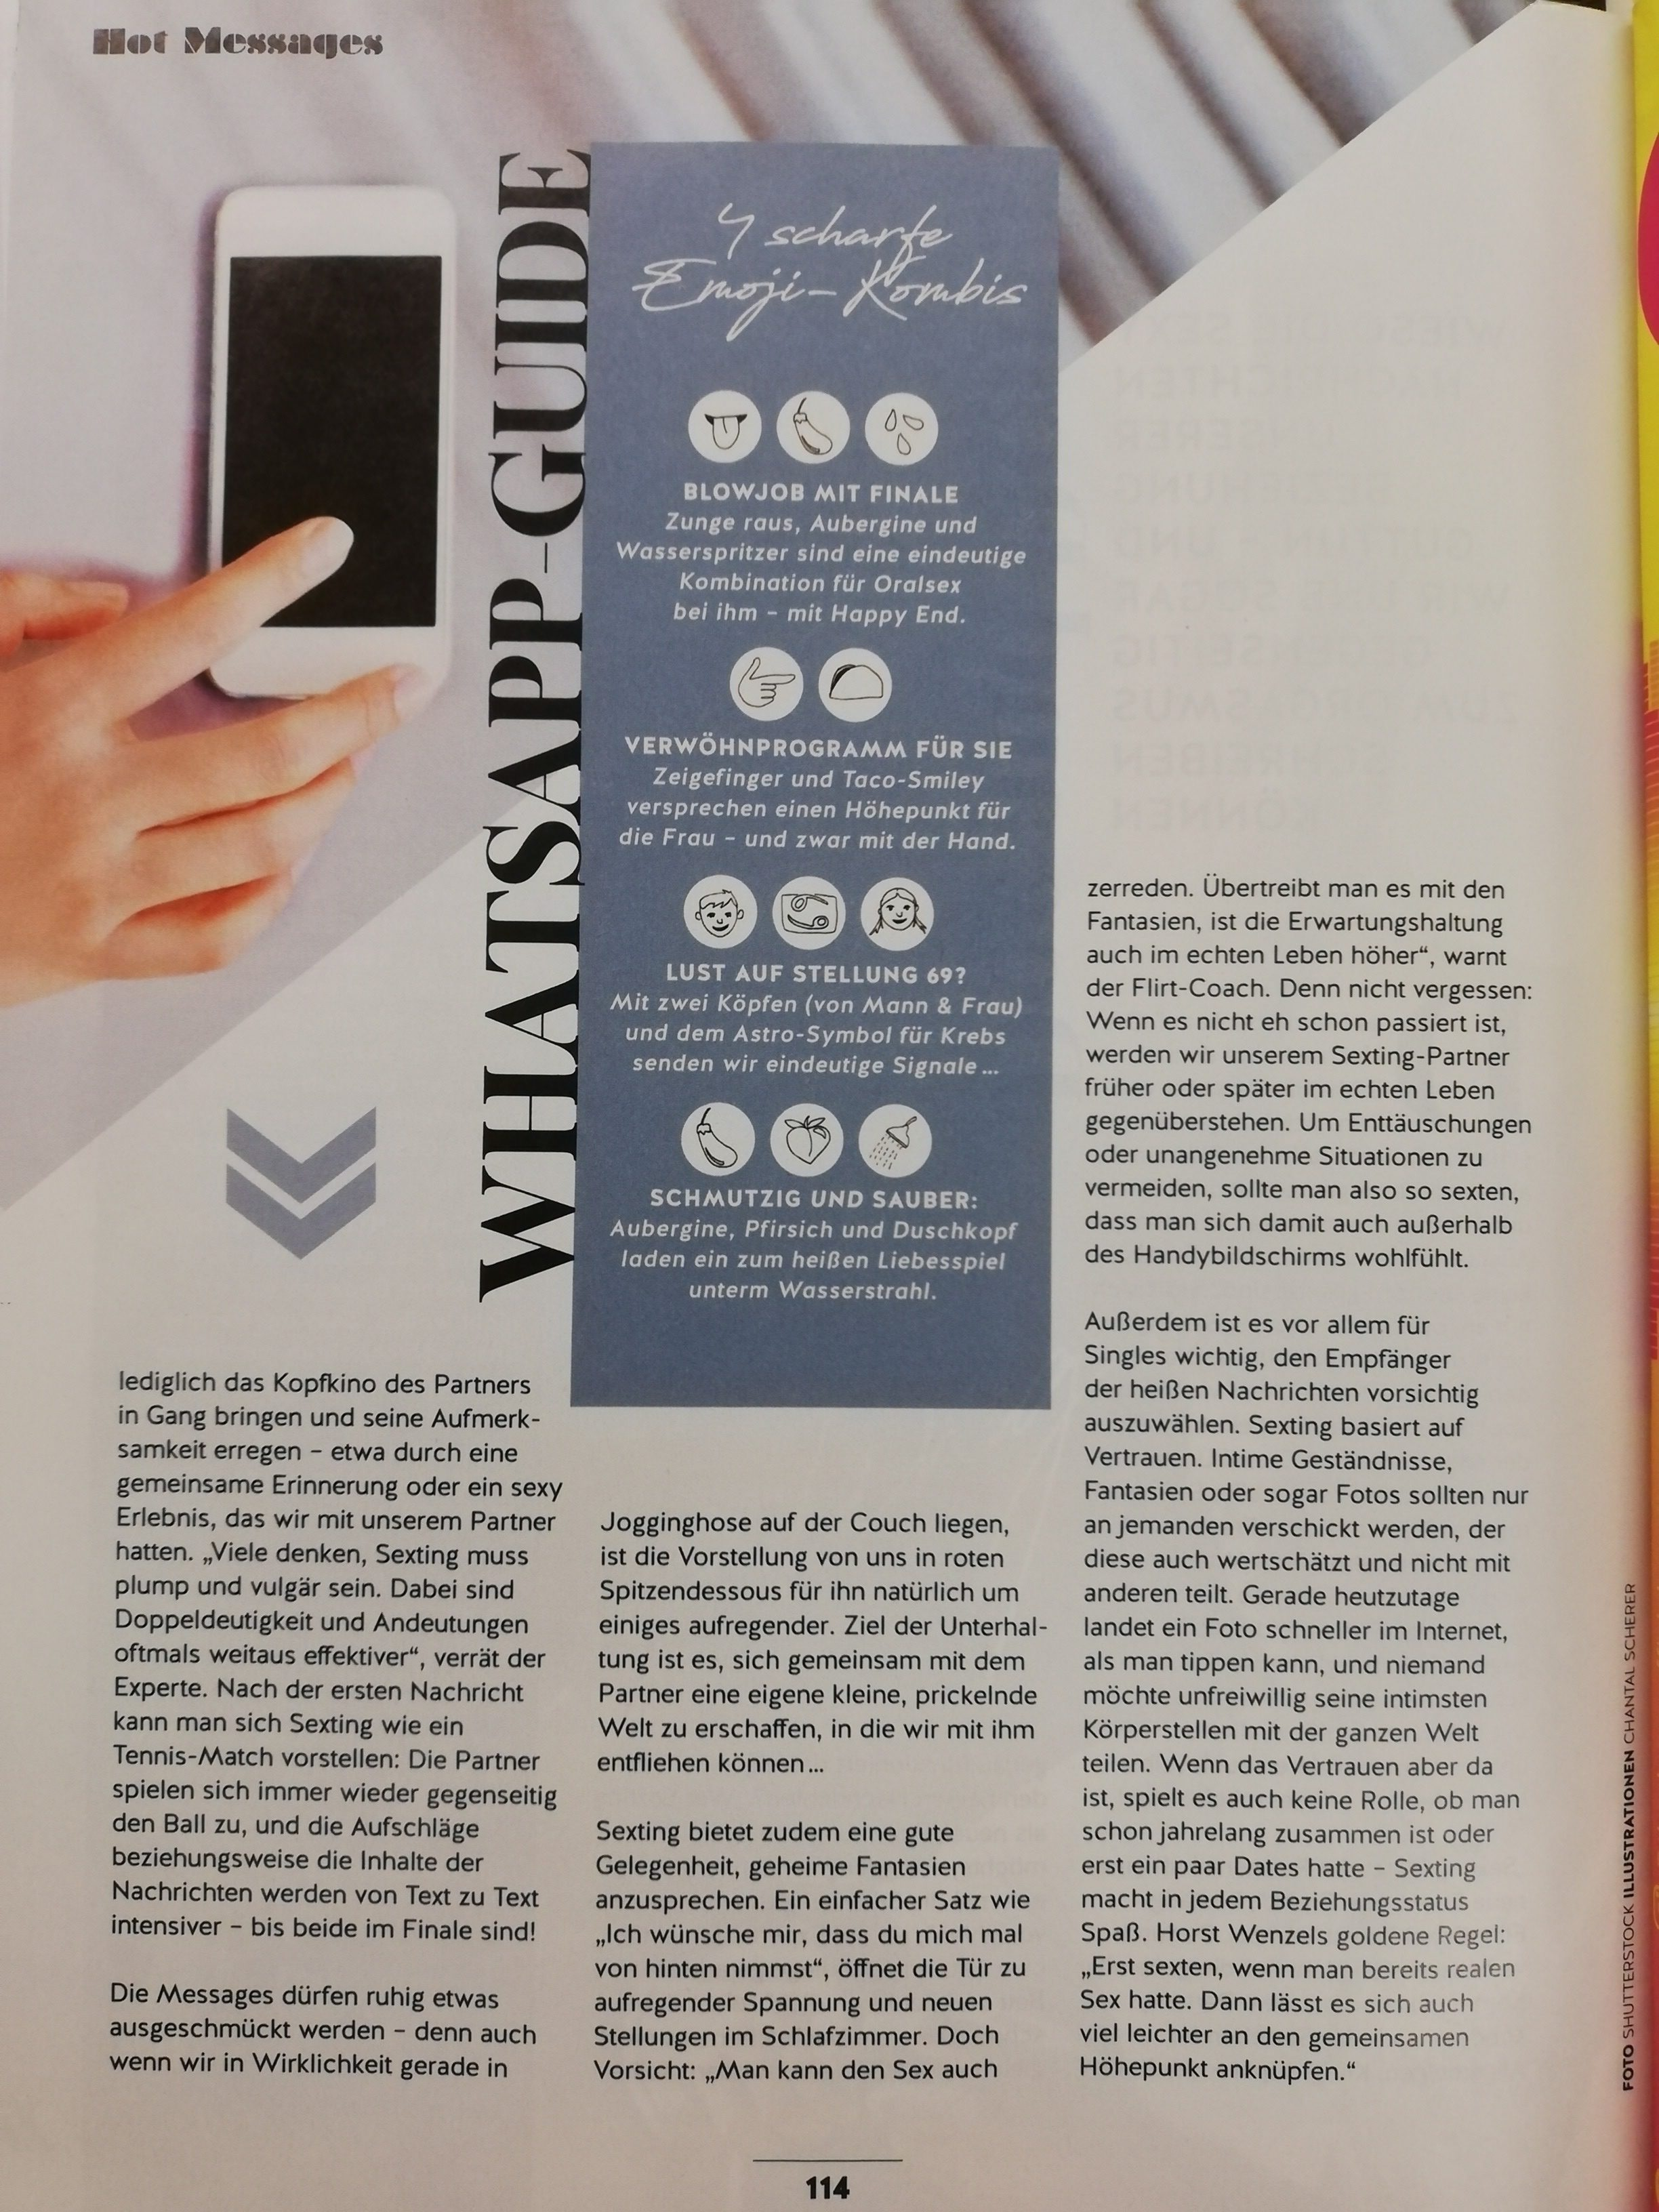 Sexting im Shape Magazin